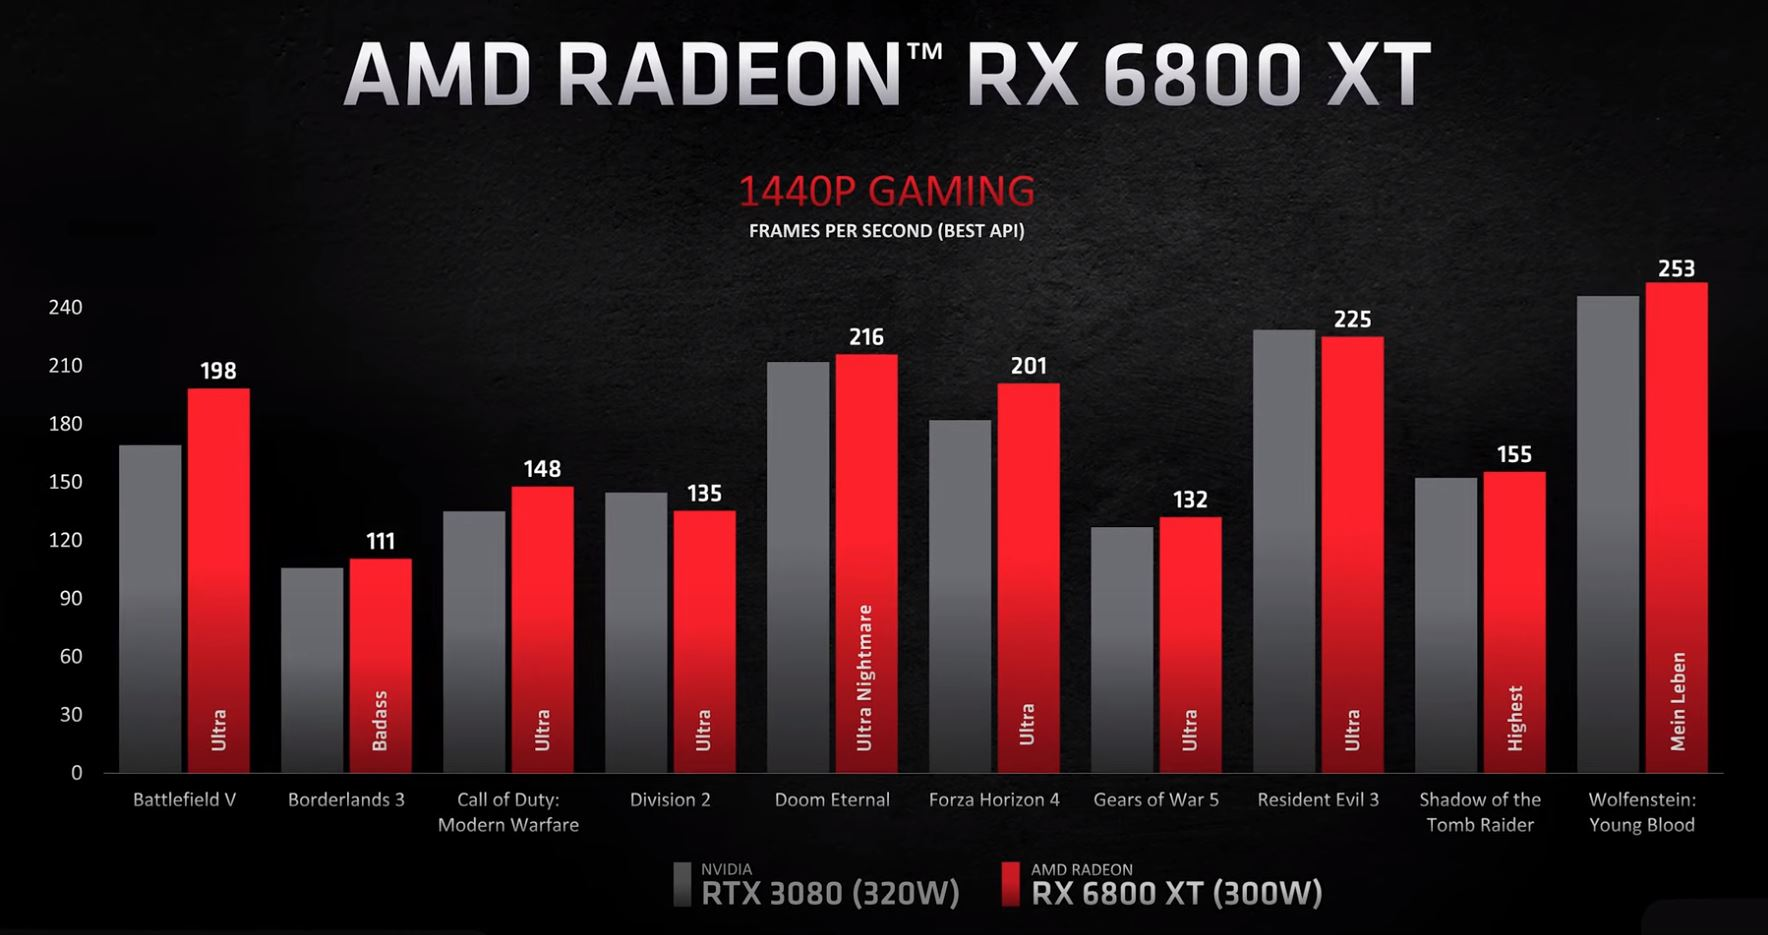 AMD Radeon RX 6800 XT V NVIDIA GeForce RTX 3080